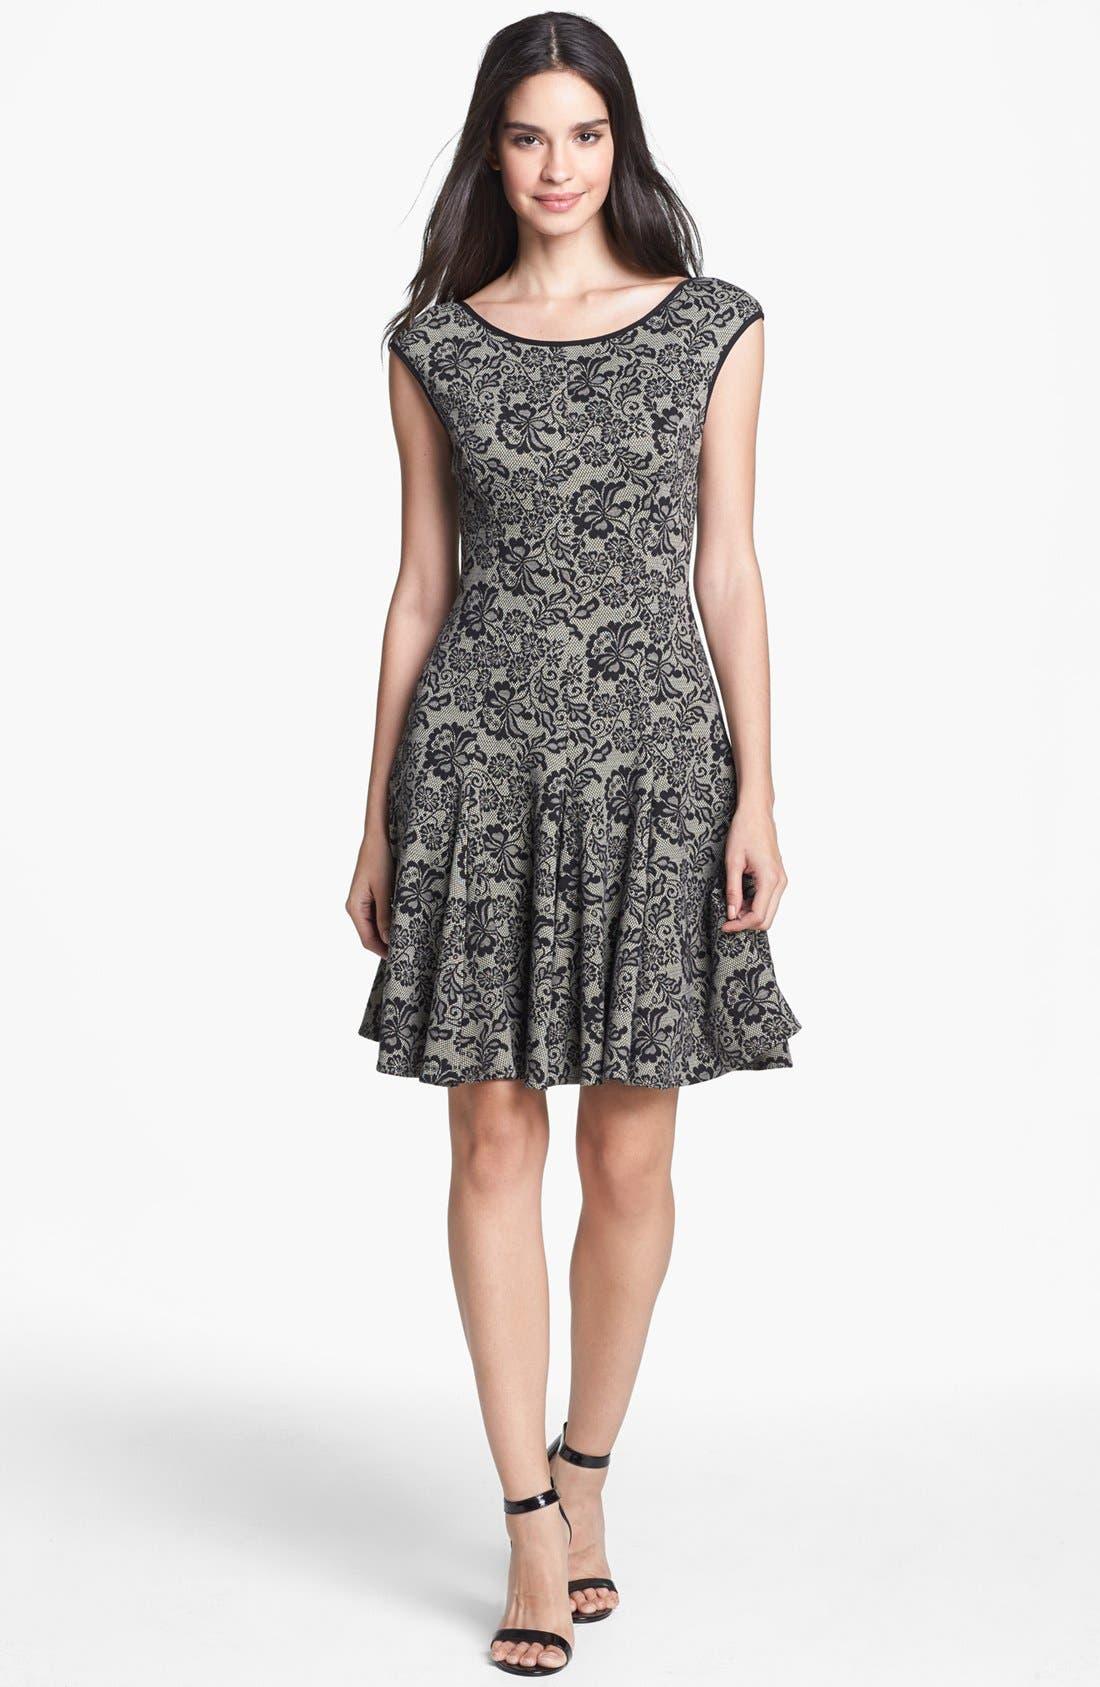 Alternate Image 1 Selected - Maggy London Lace Print Jacquard Fit & Flare Dress (Petite)